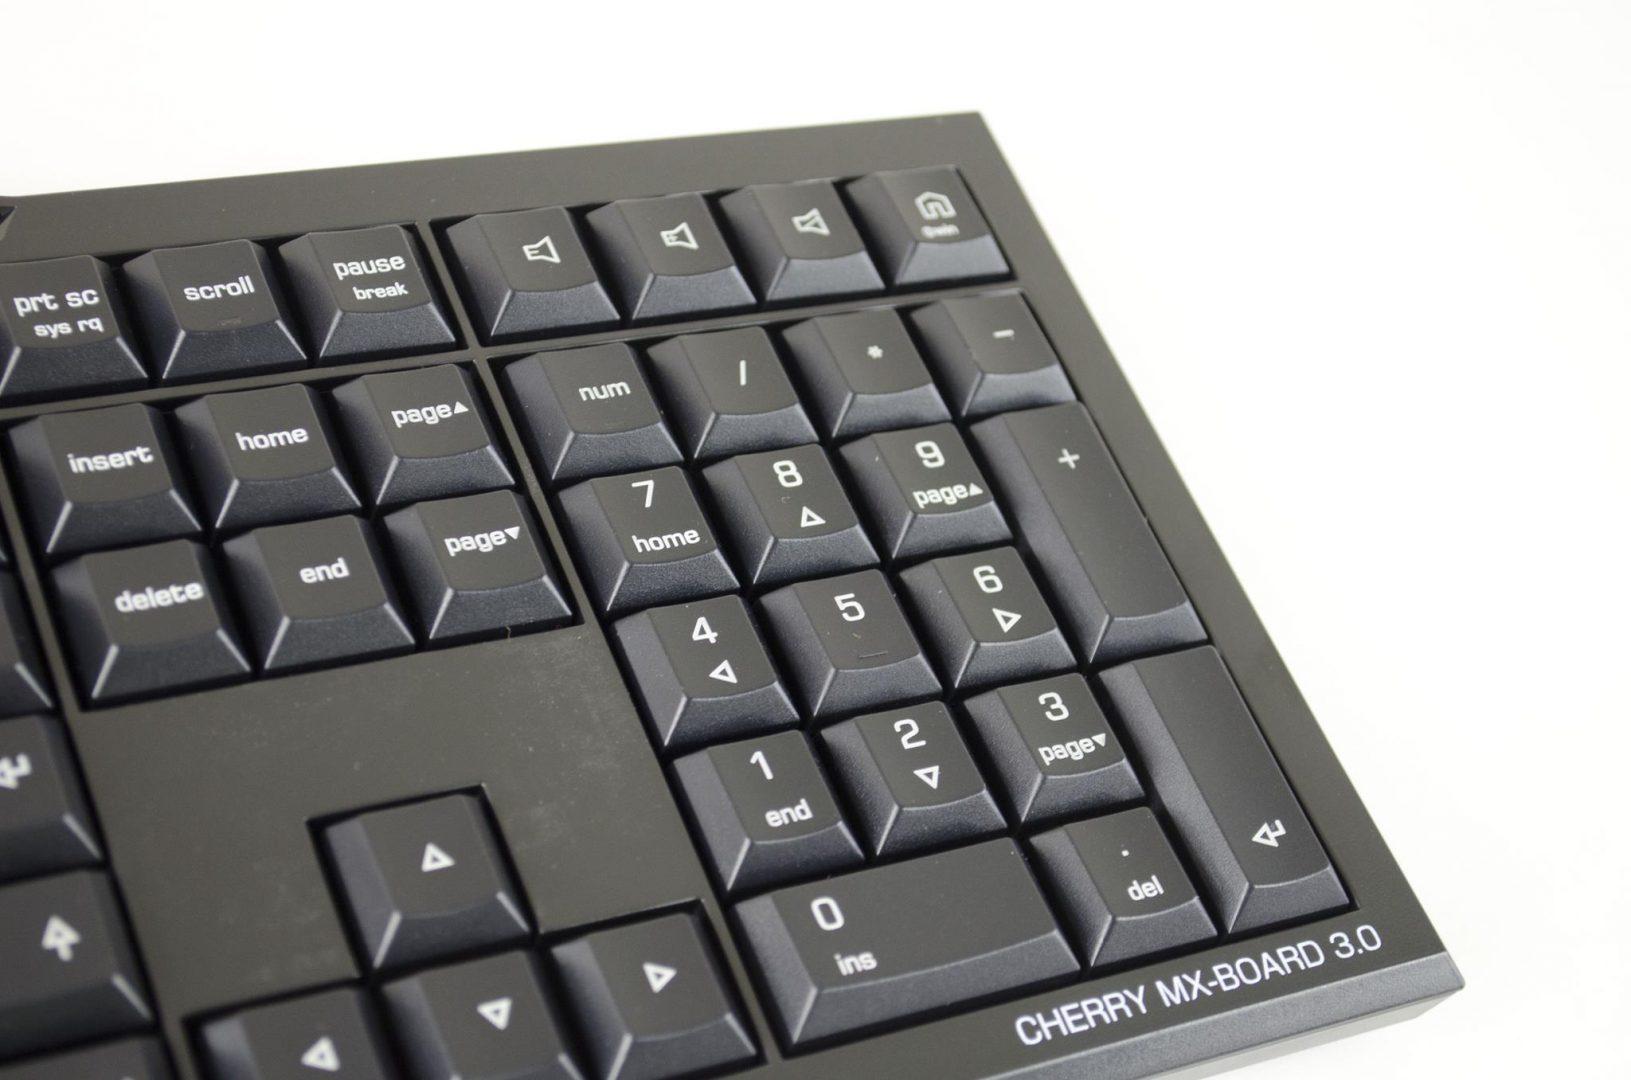 Cherry MX Board 3_6